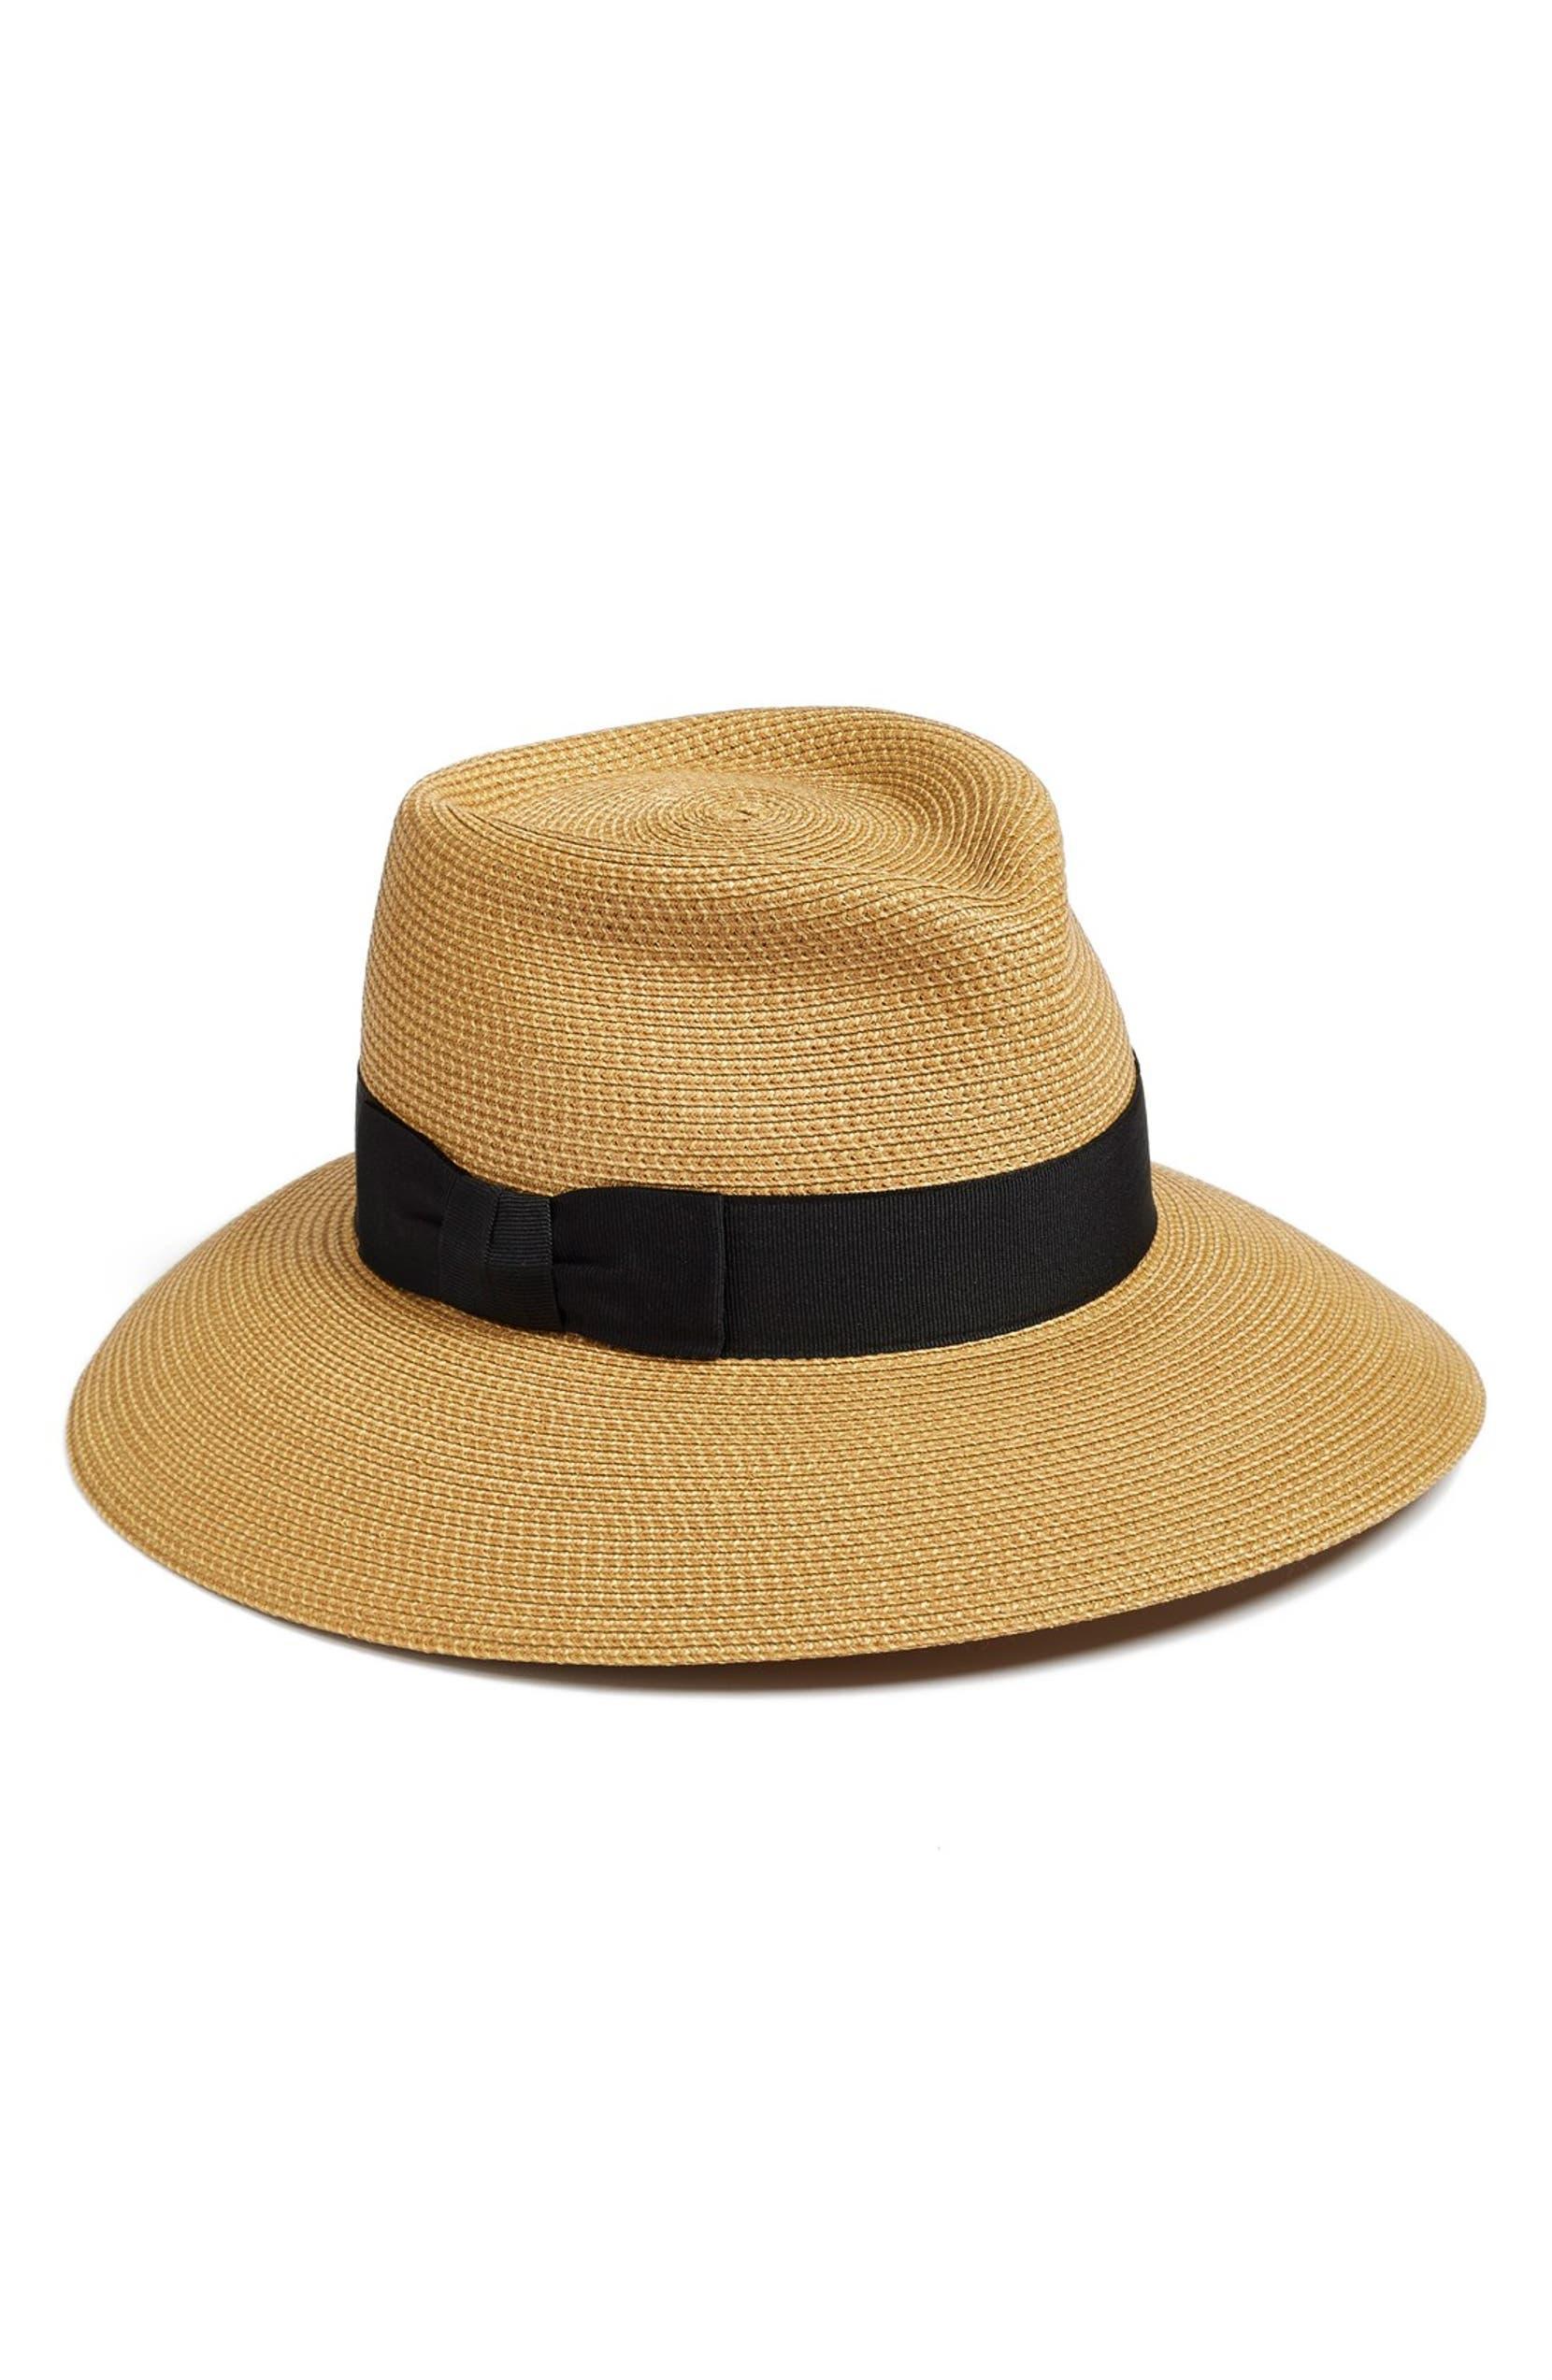 Eric Javits  Phoenix  Packable Fedora Sun Hat  1babfb6a1f7